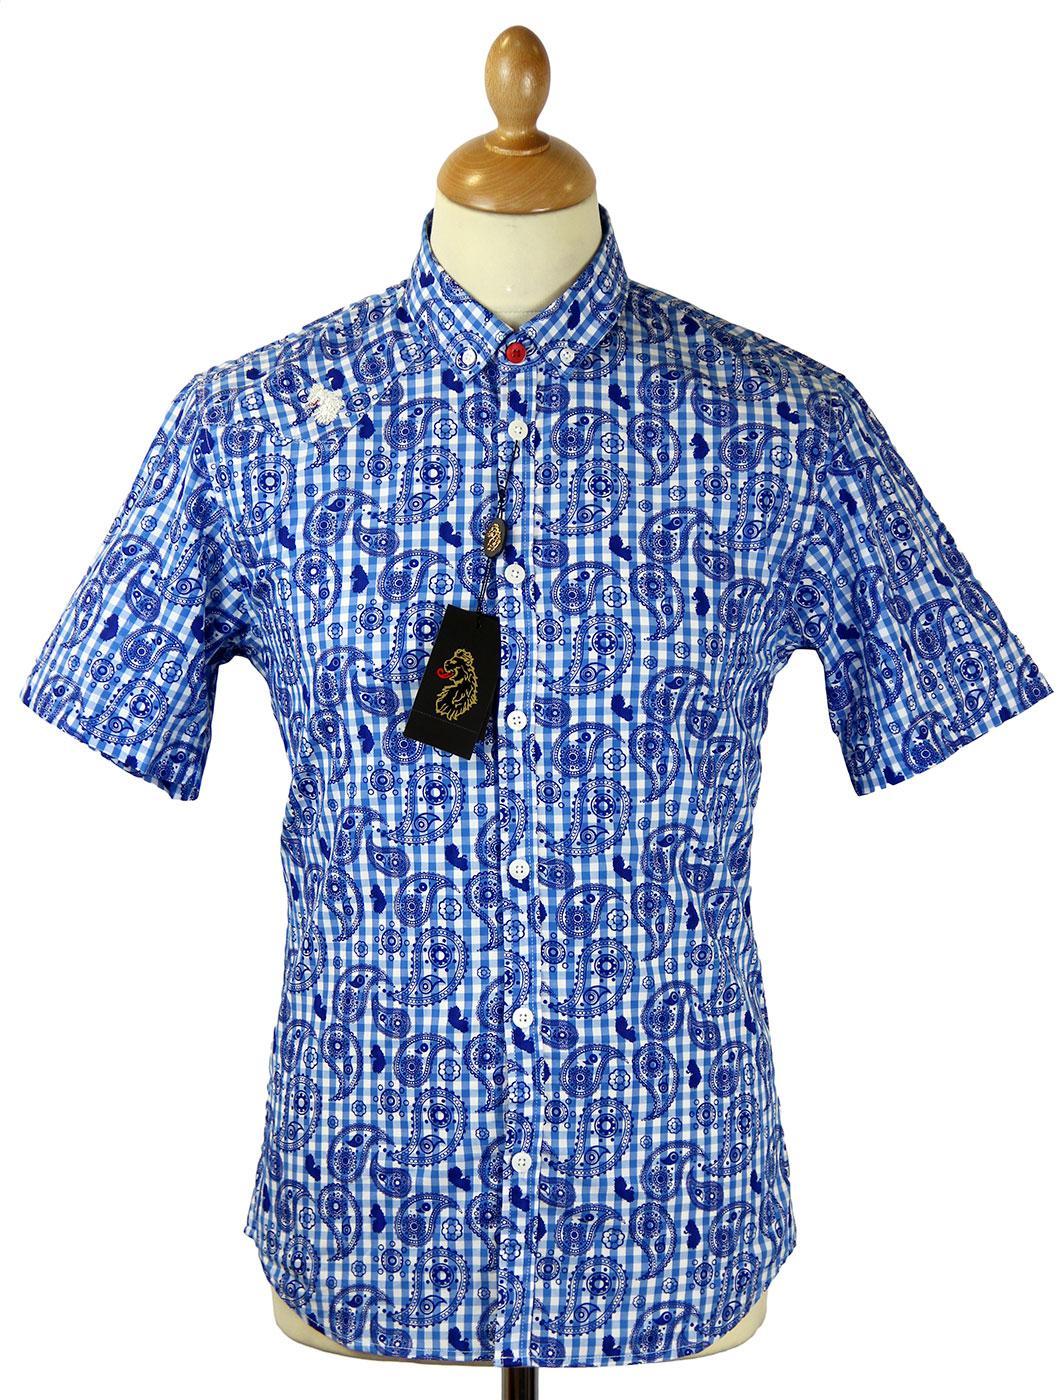 Magnum LUKE 1977 Retro Gingham Paisley Mod Shirt B